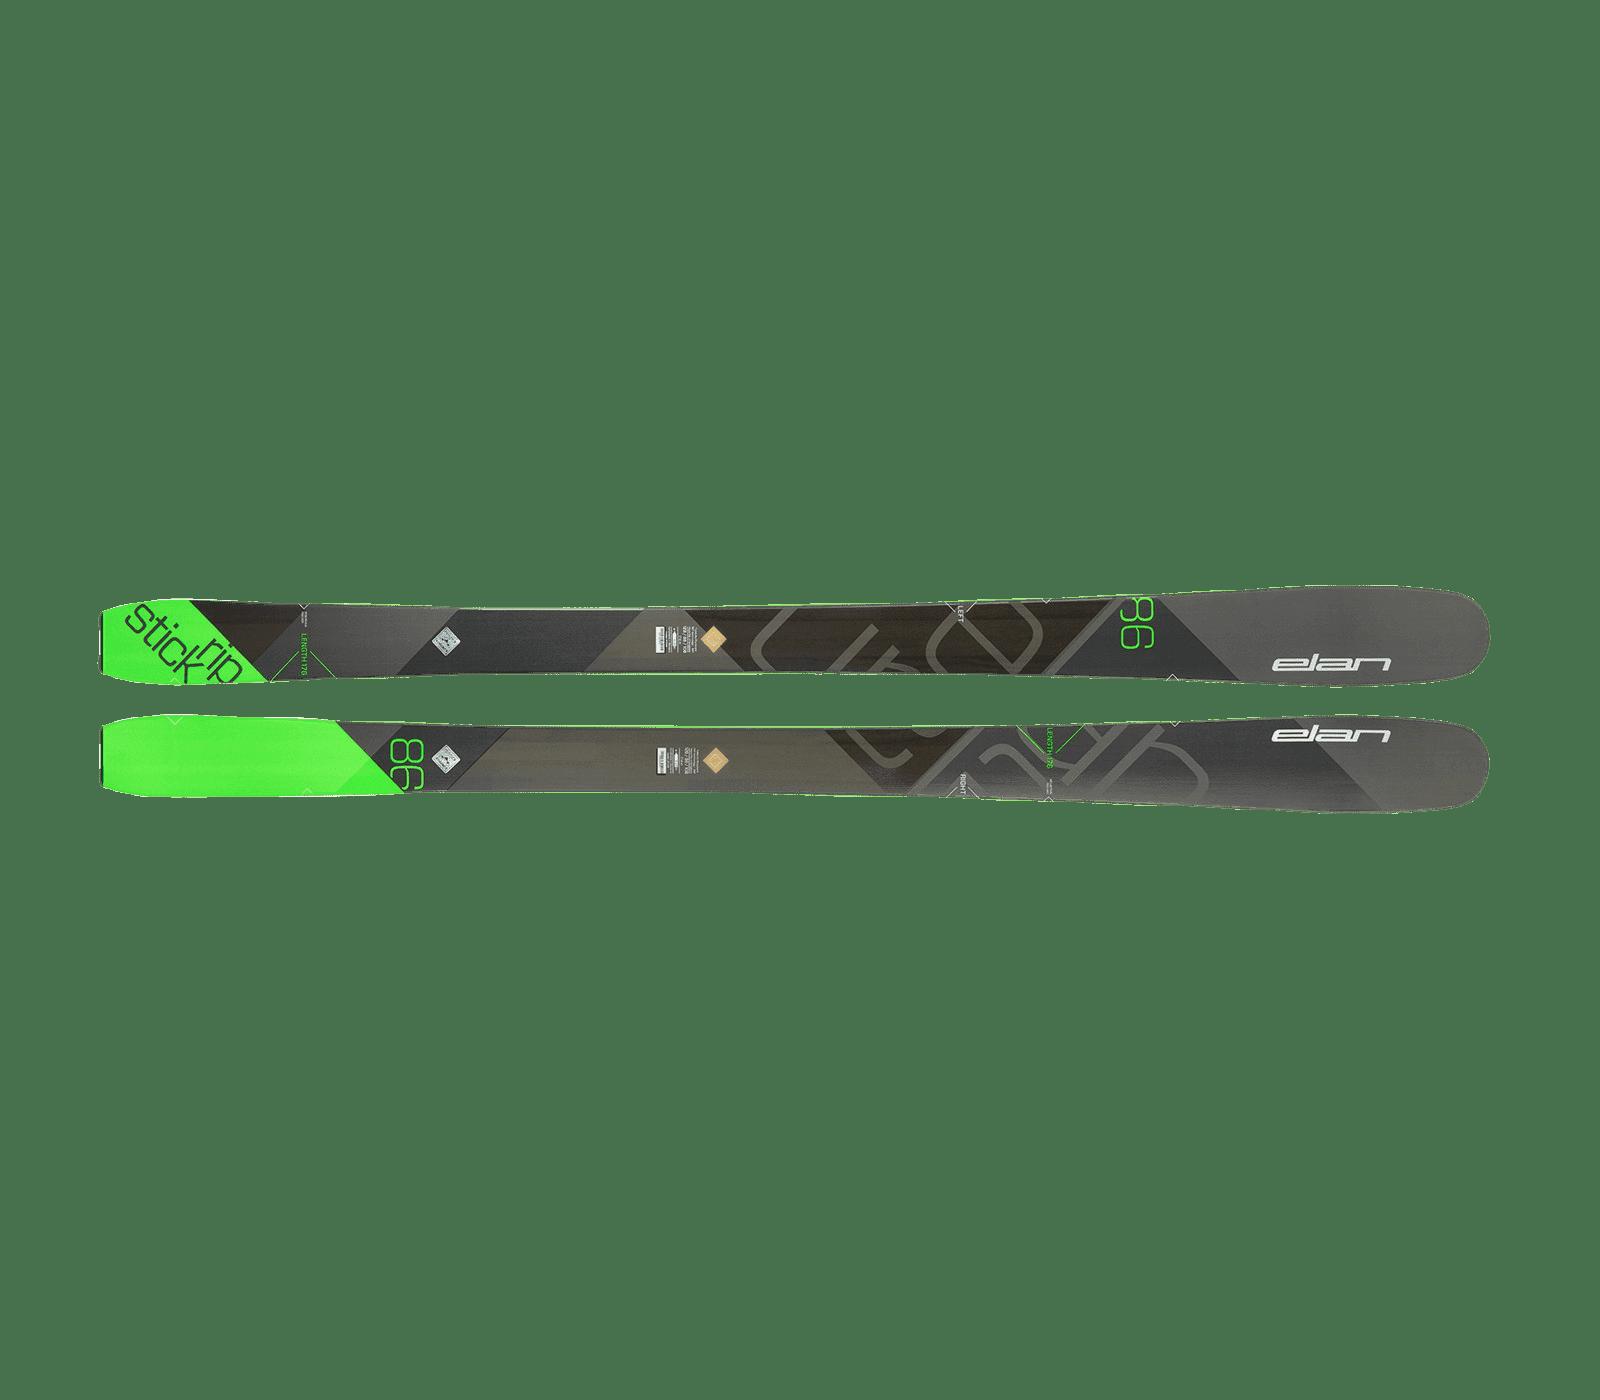 Ski ripstick 86 rnt ps m 176 + els 11wb